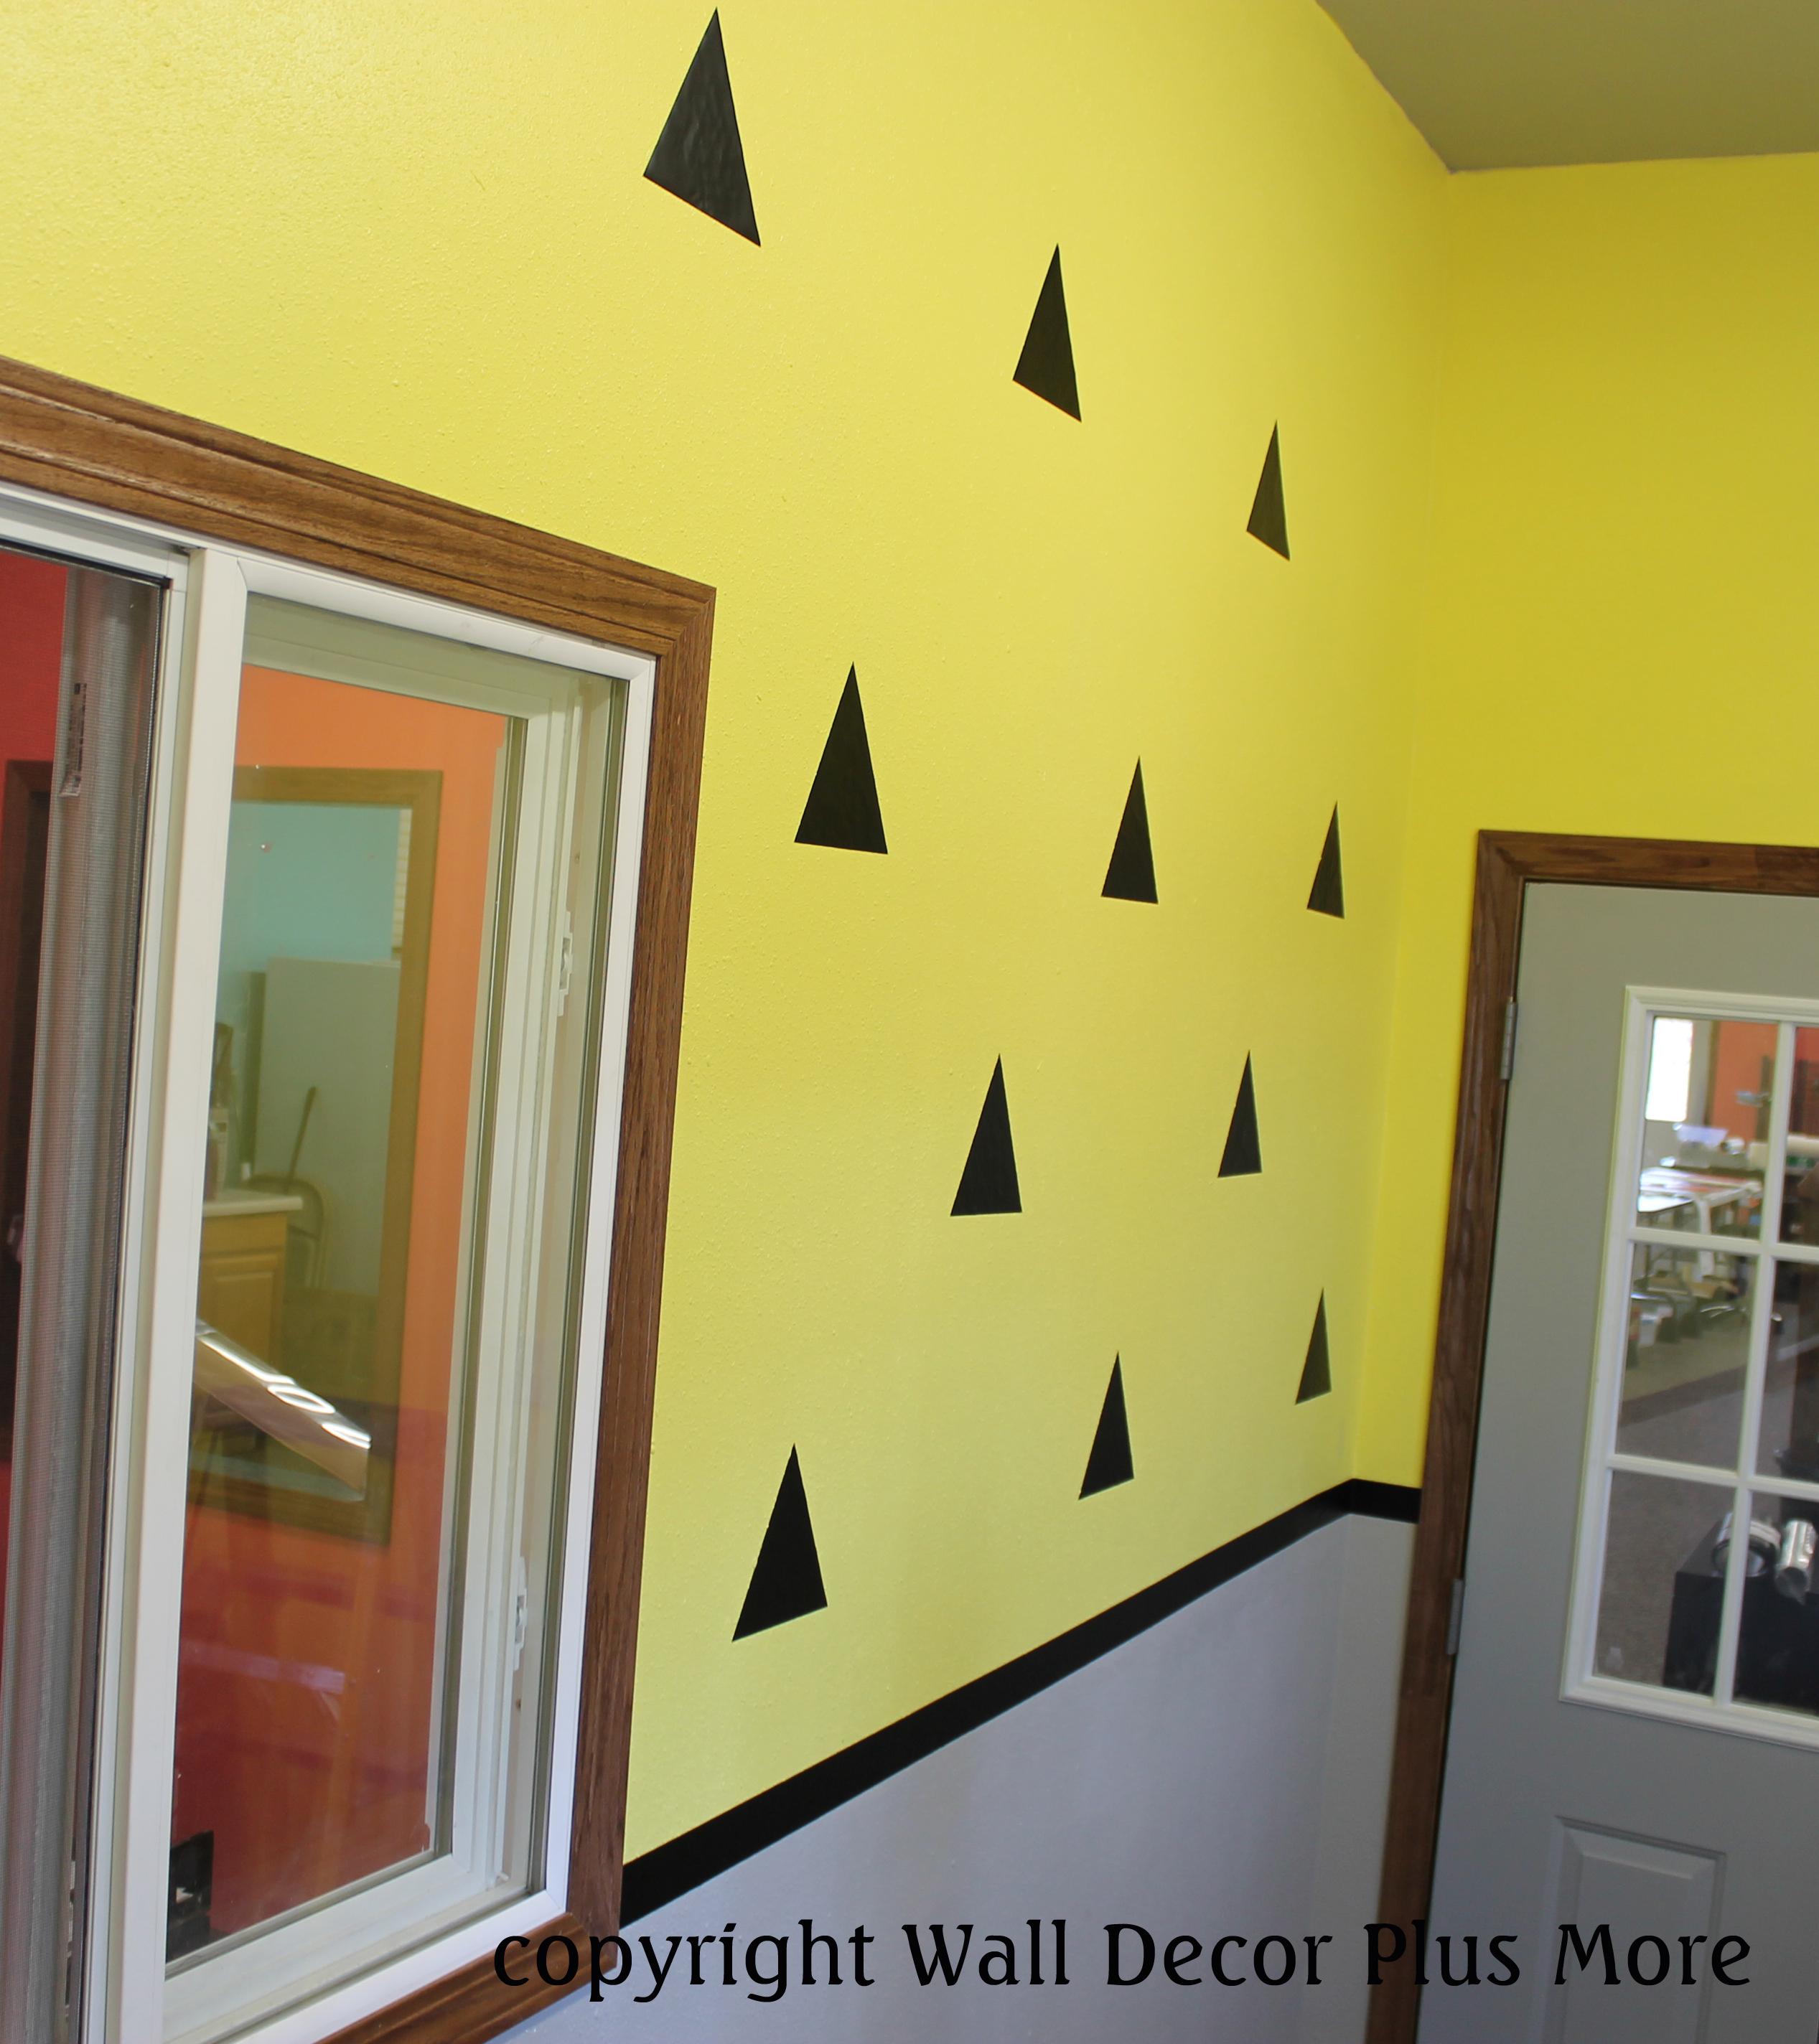 Wall Decor Plus More : Wall decor ideas under plus more